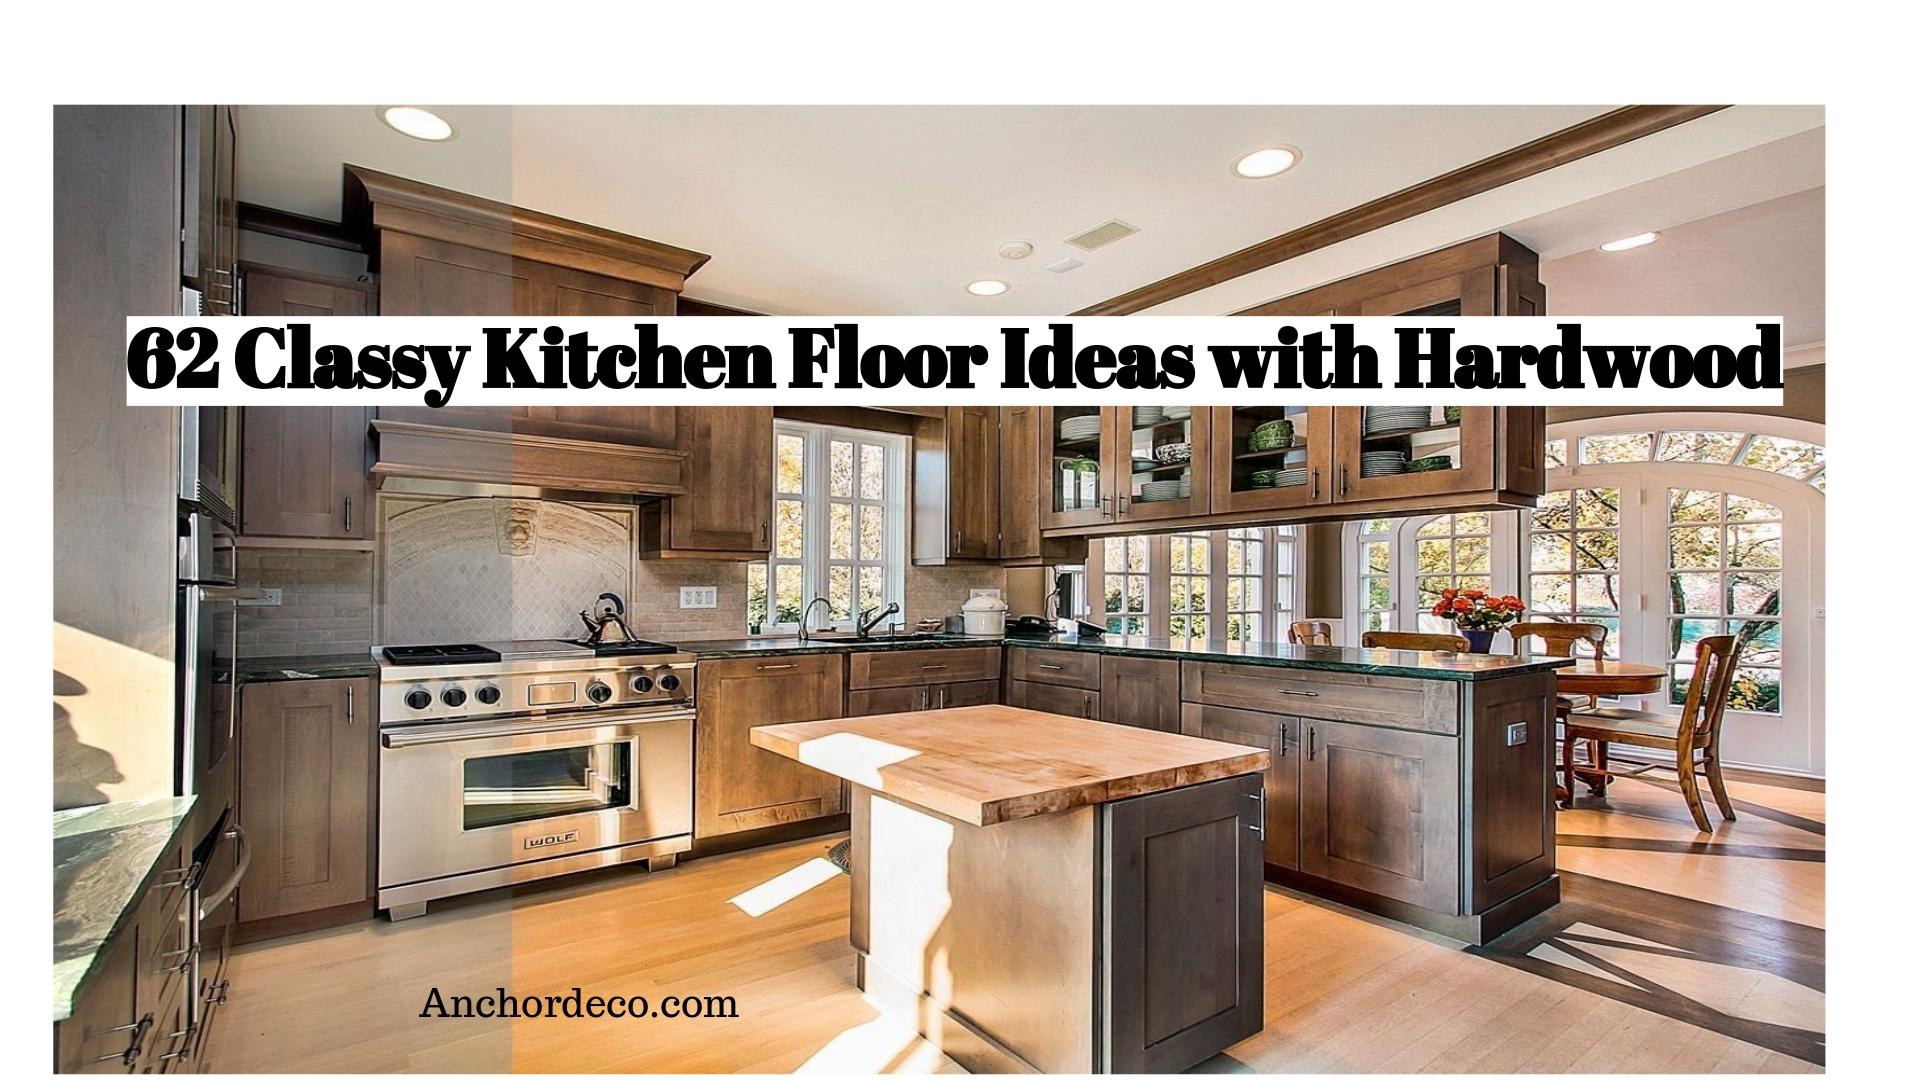 62 Classy Kitchen Floor Ideas With Hardwood Anchordeco Com